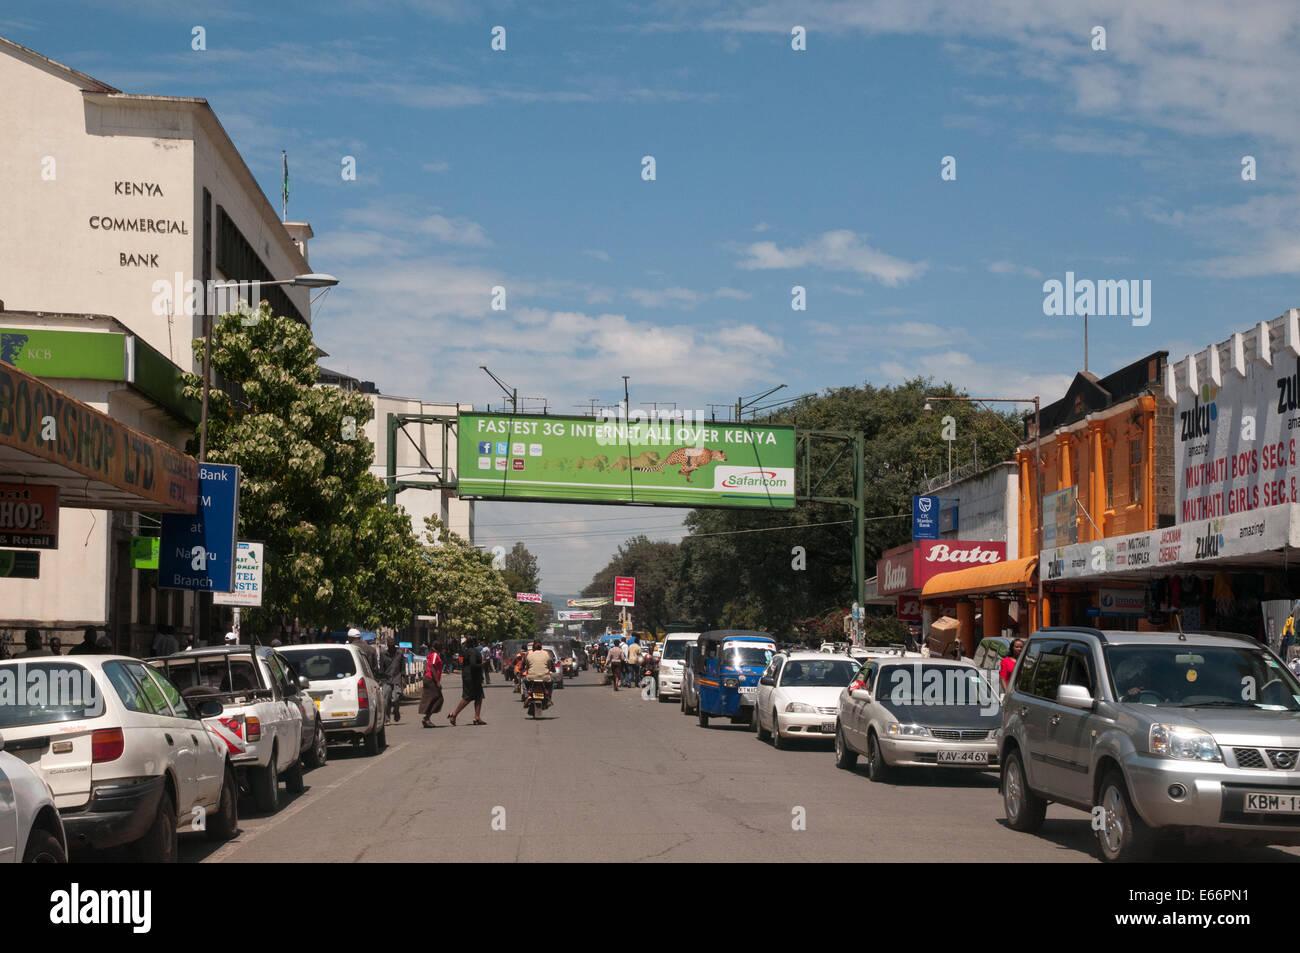 People and traffic on Kenyatta Avenue Nakuru Kenya East Africa with advertising hoarding for 3g Network Stock Photo